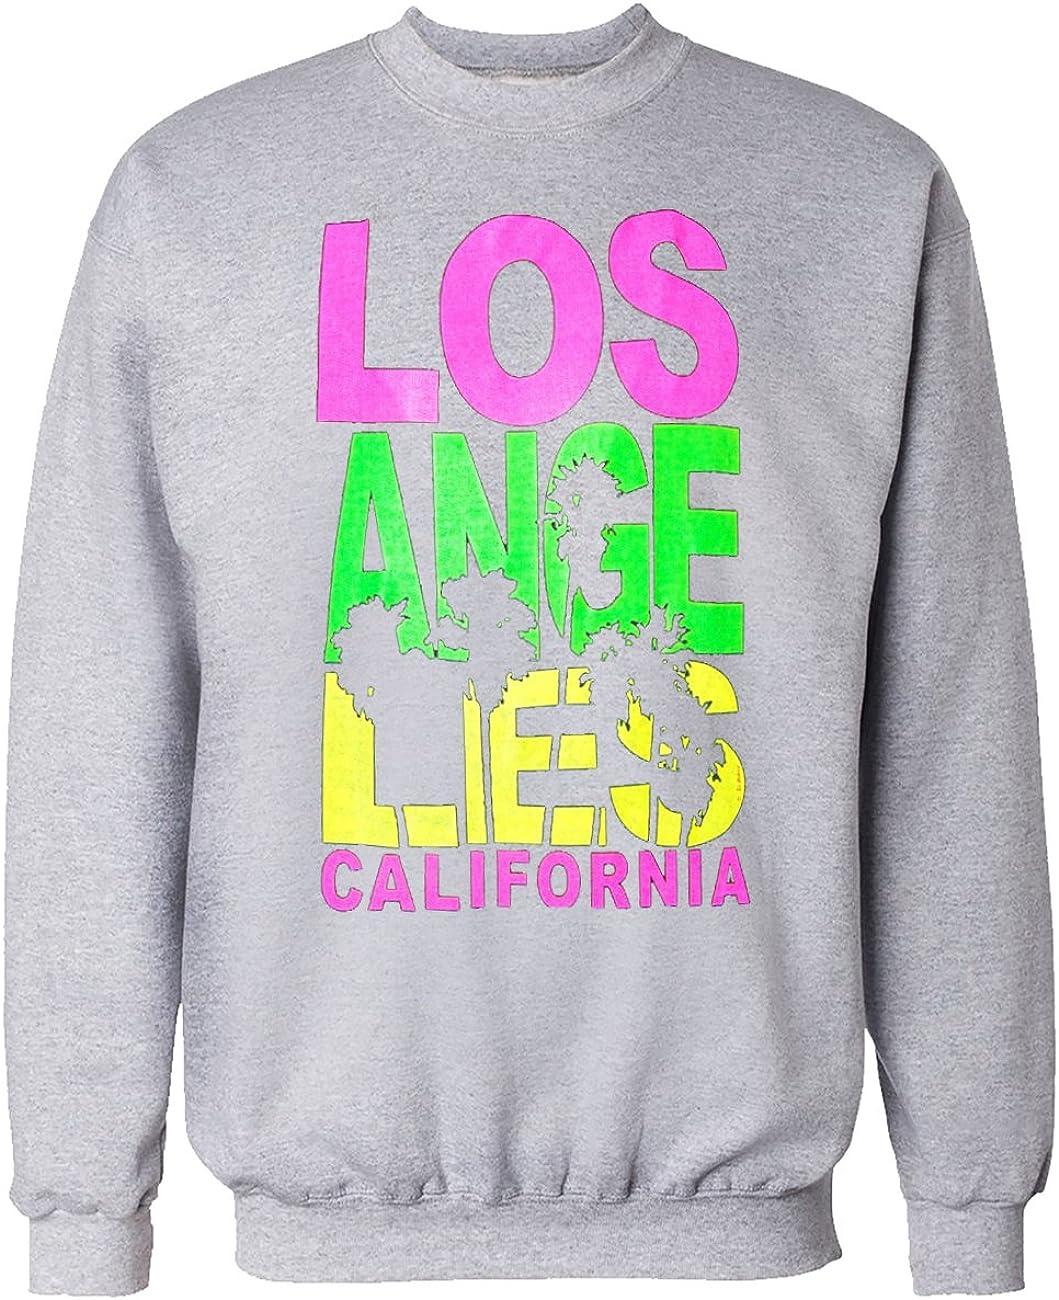 California Los Angeles Designs Unisex Crewneck